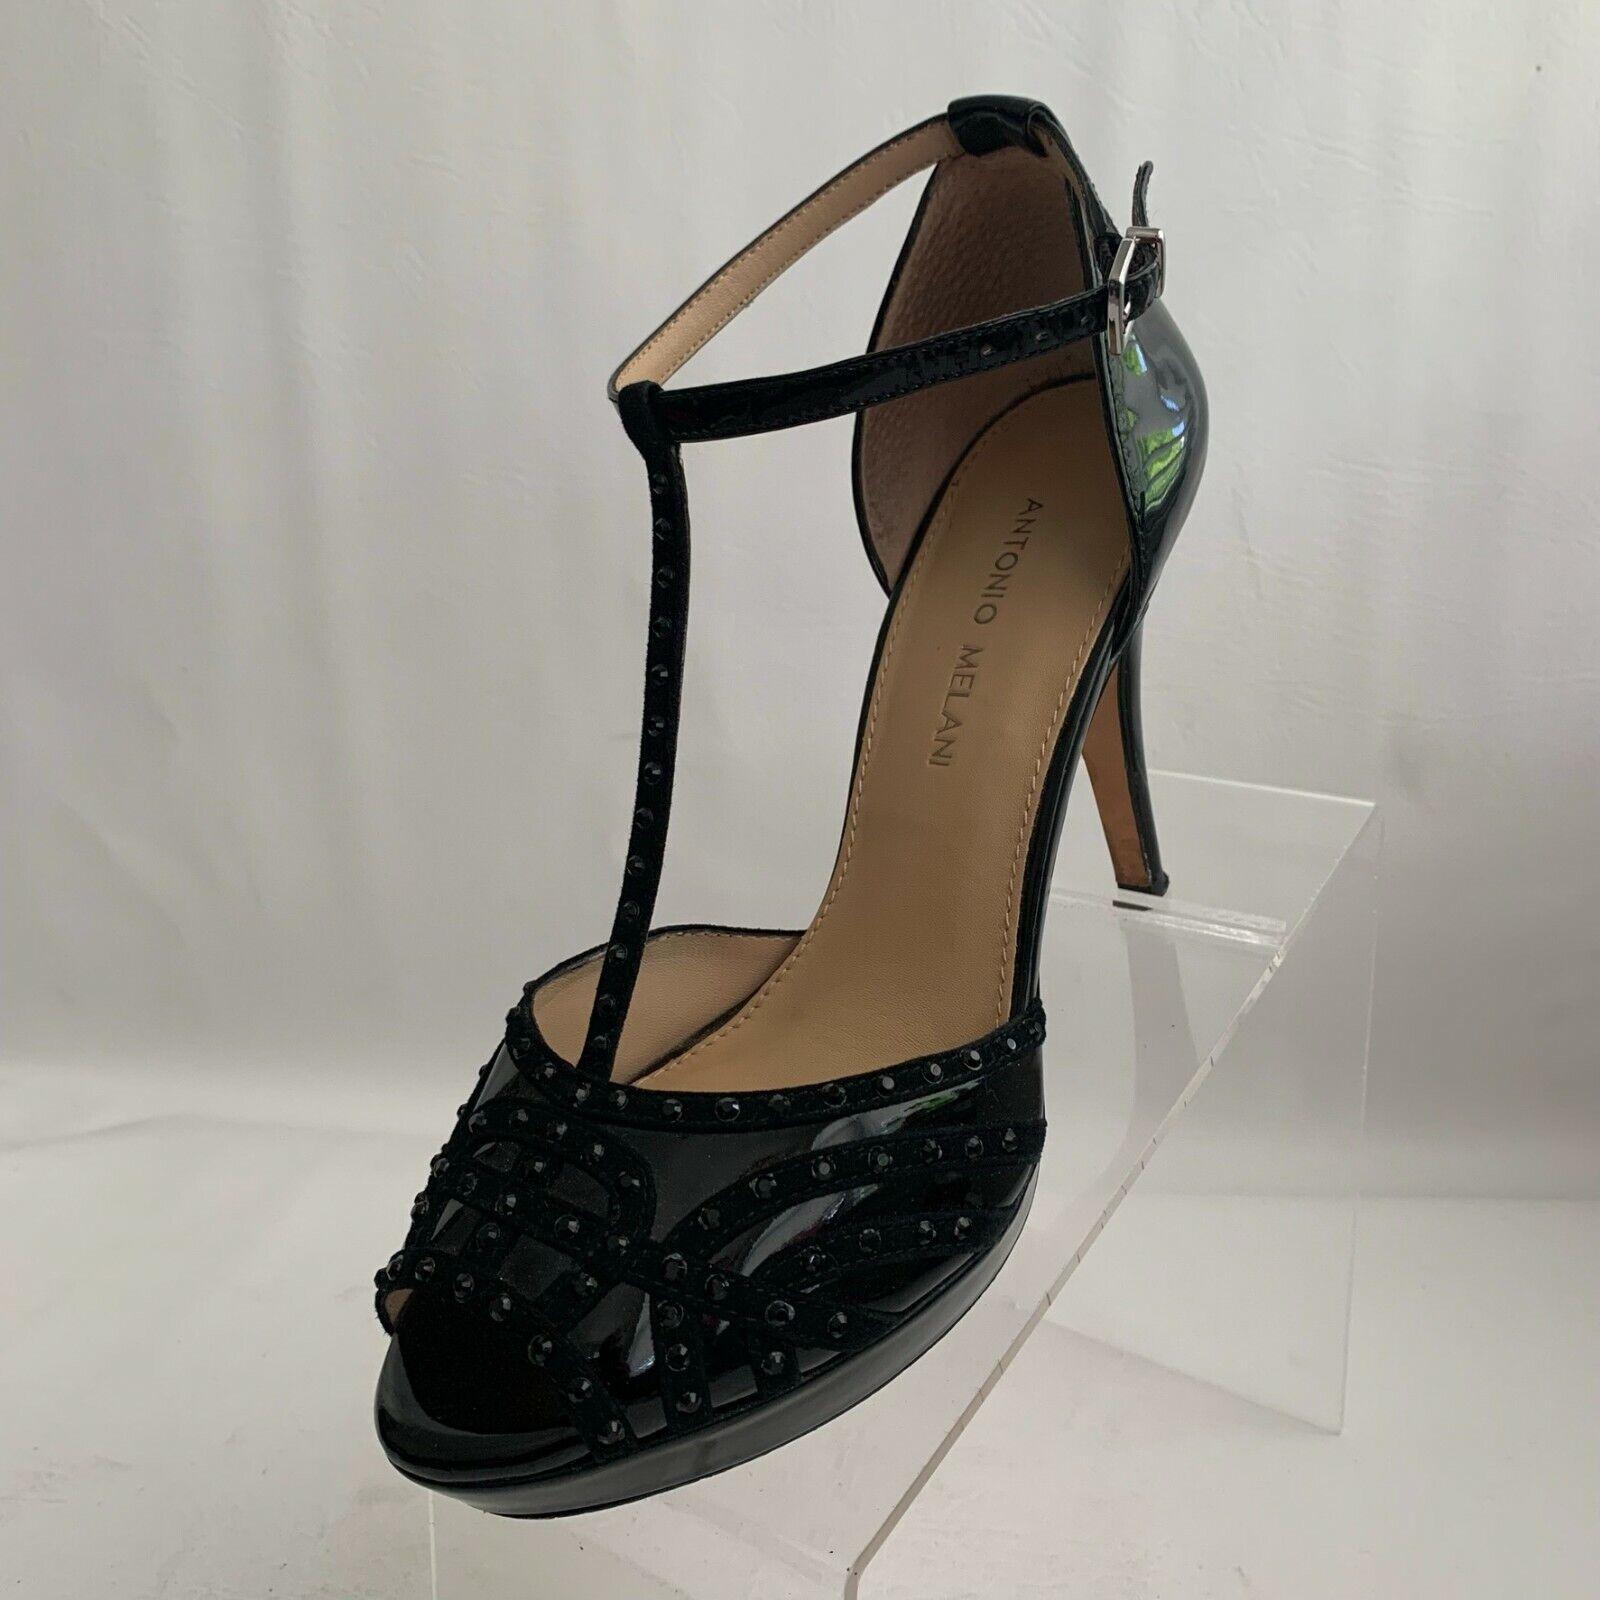 Antonio Melani T-Strap Heels Black Patent Leather Peep Toe Buckle Shoes Size 9M